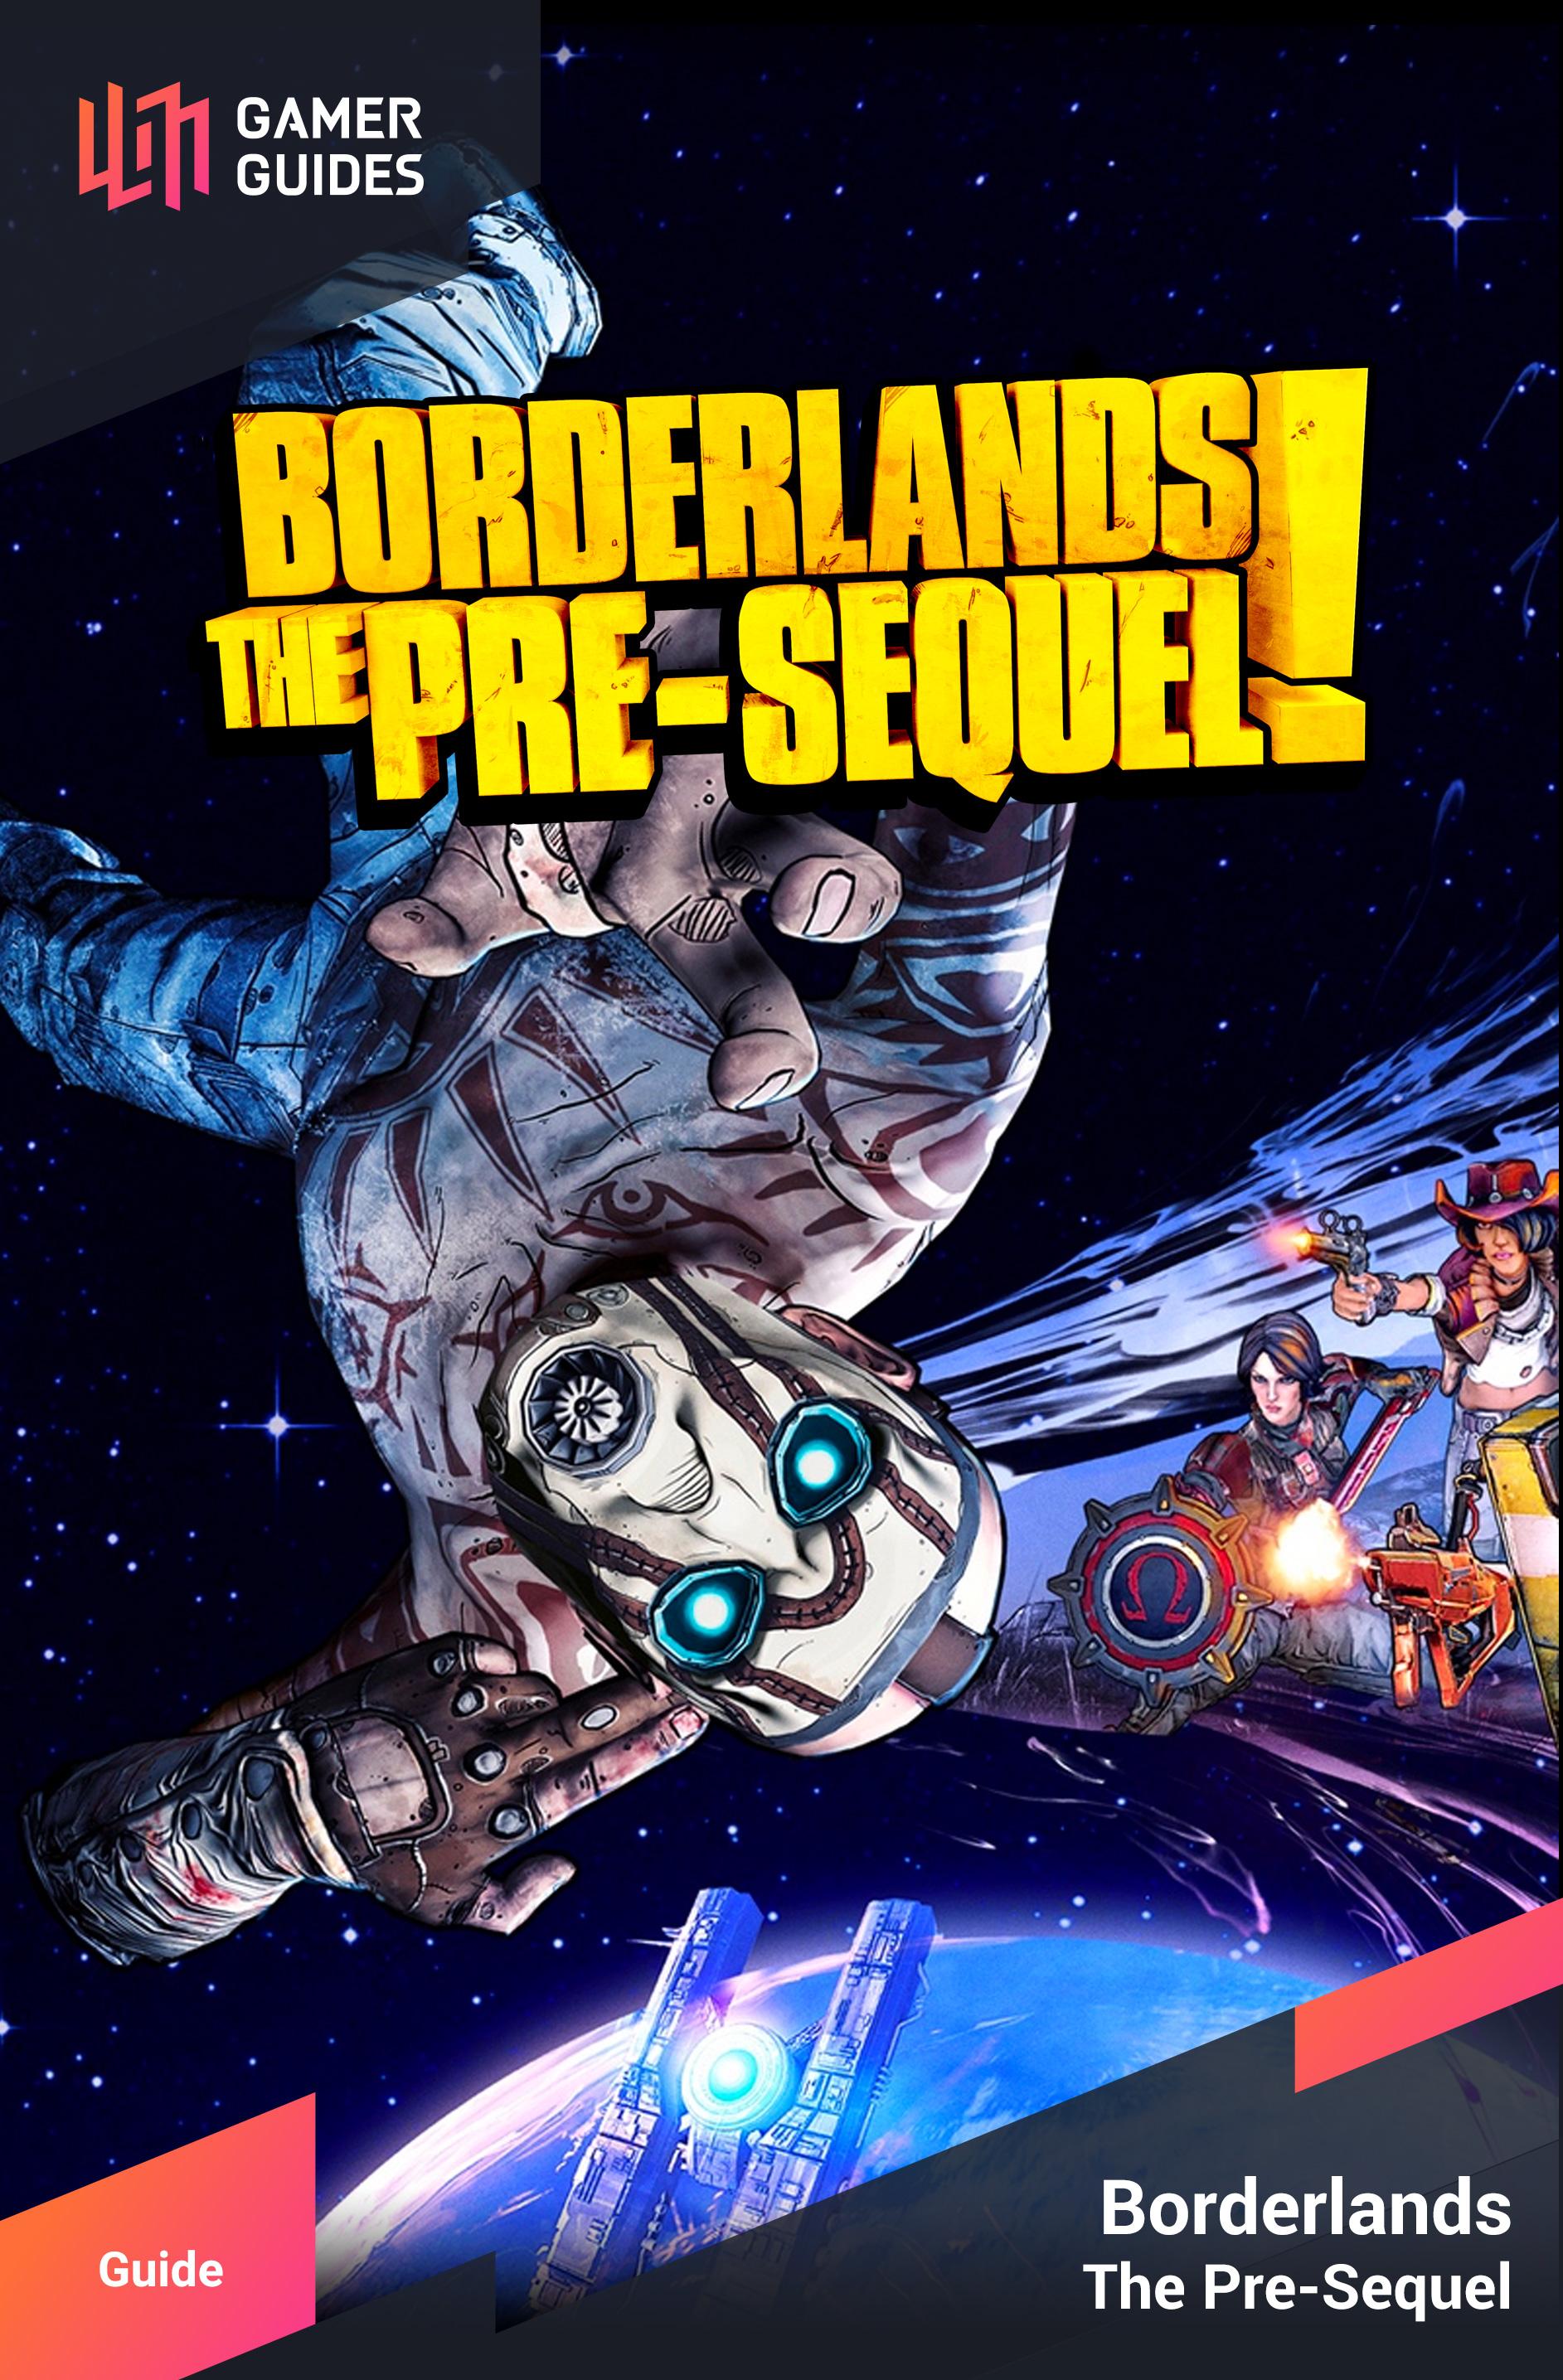 The Secret Chamber | Borderlands: The Pre-Sequel | Gamer Guides